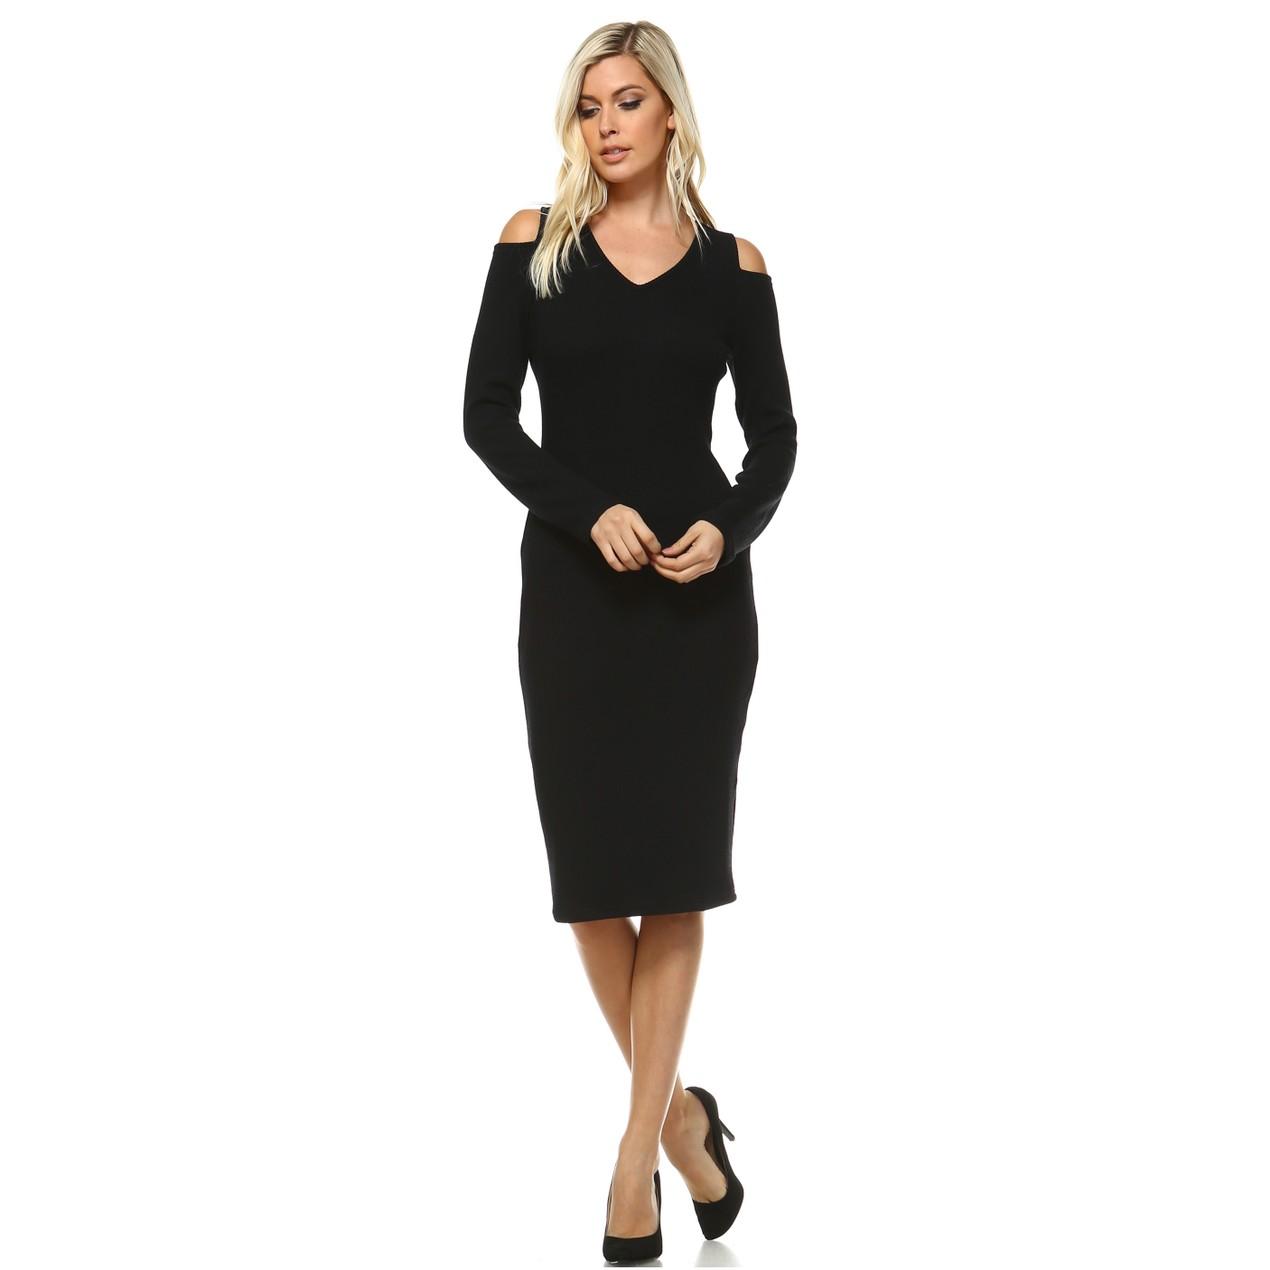 c6be042ecb5 White Mark Taline  Cut Out Shoulder Midi Sweater Dress - Tanga